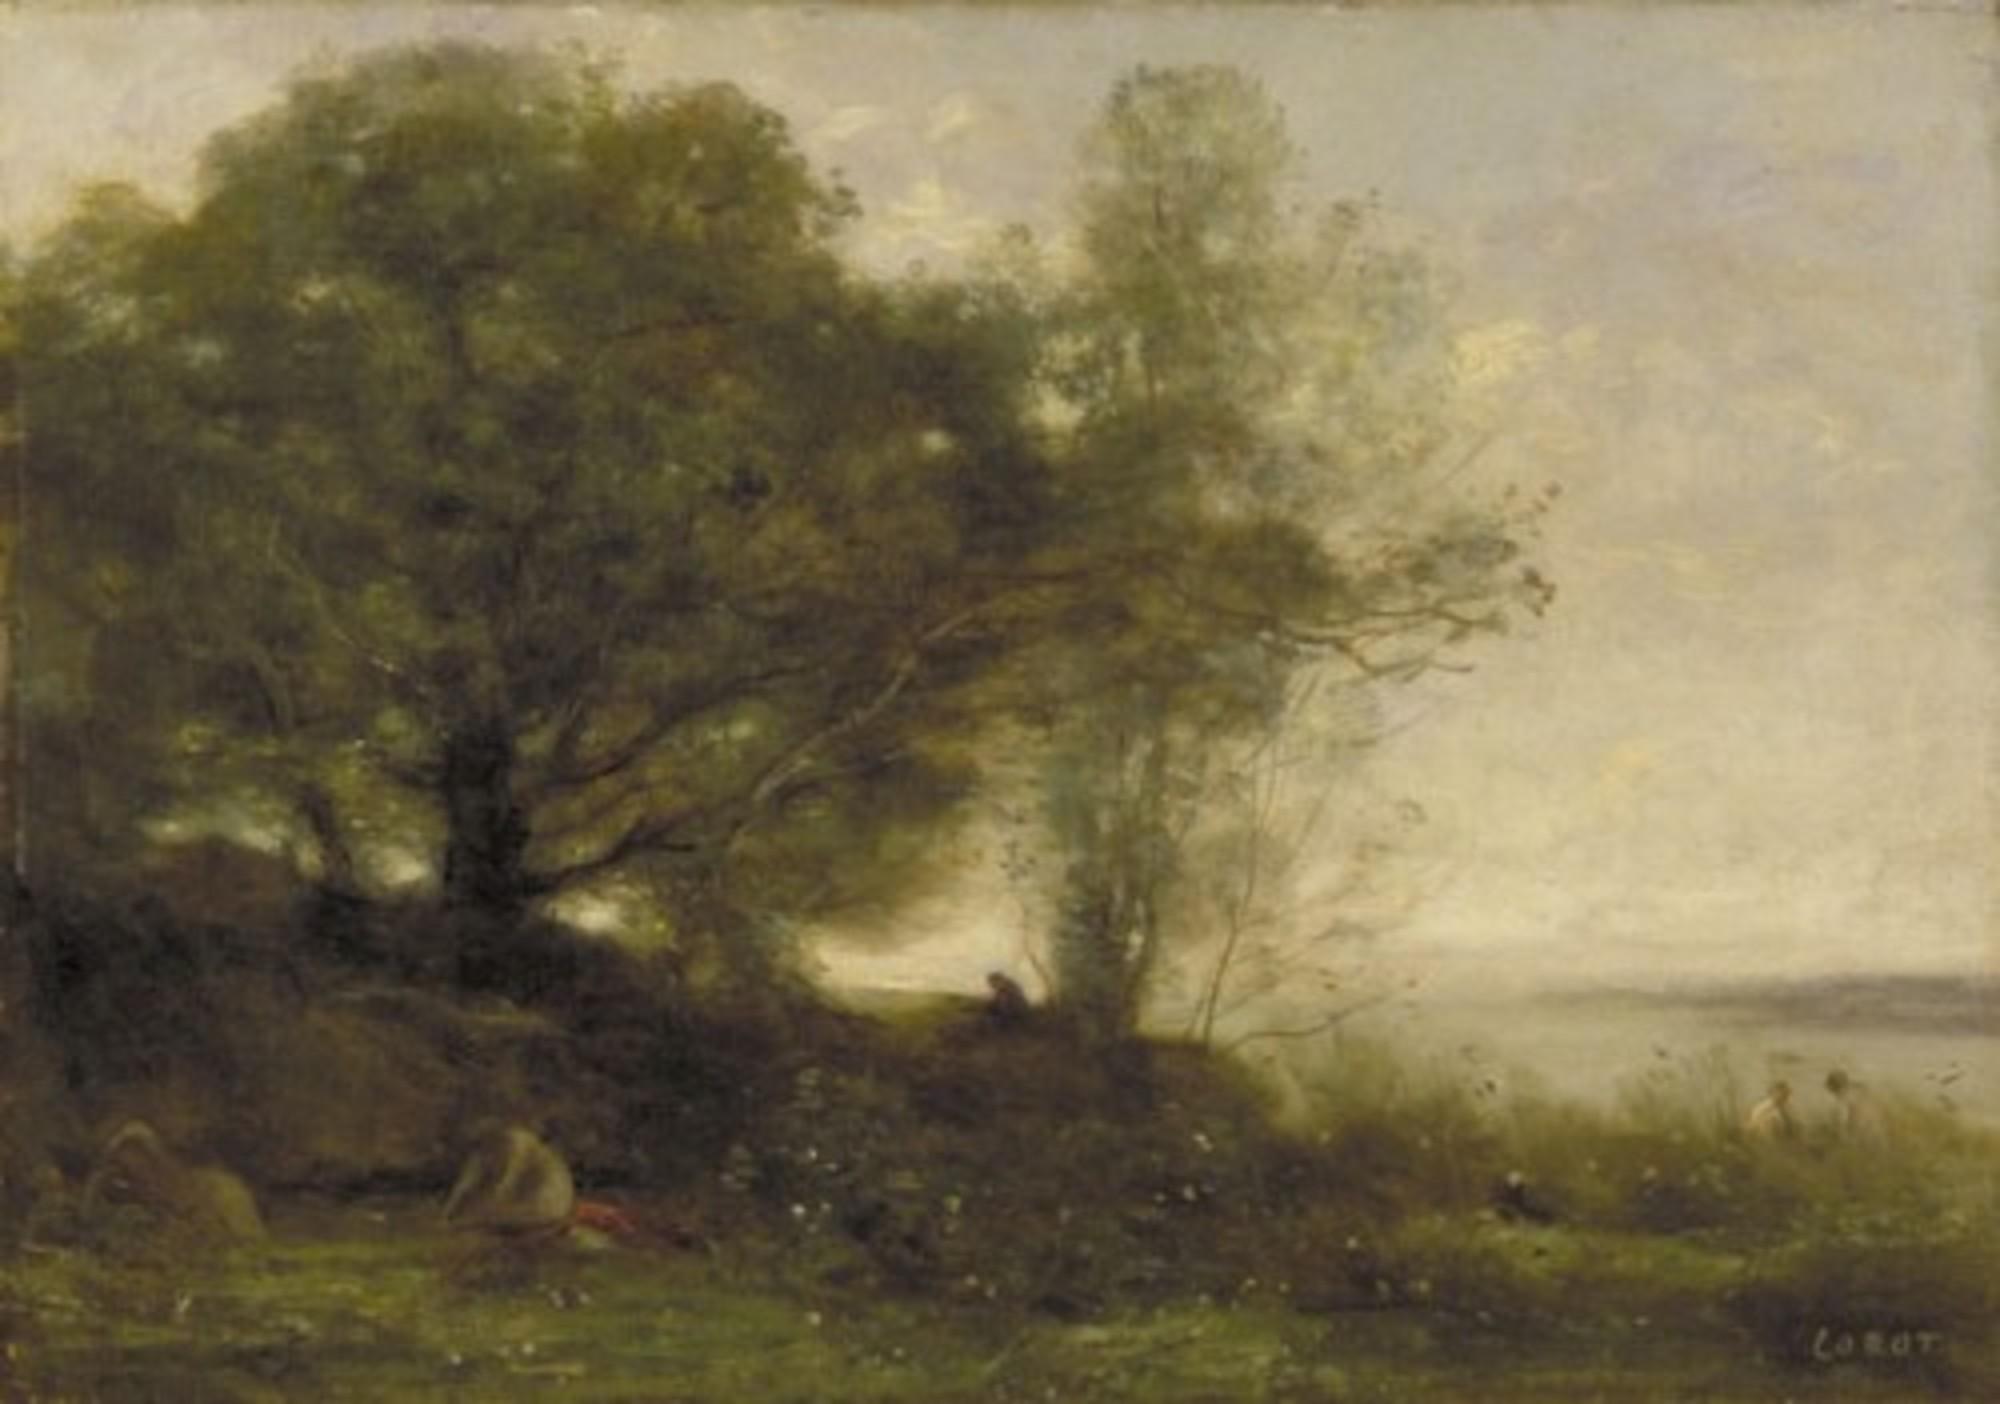 Corot---The-Bathers.jpg